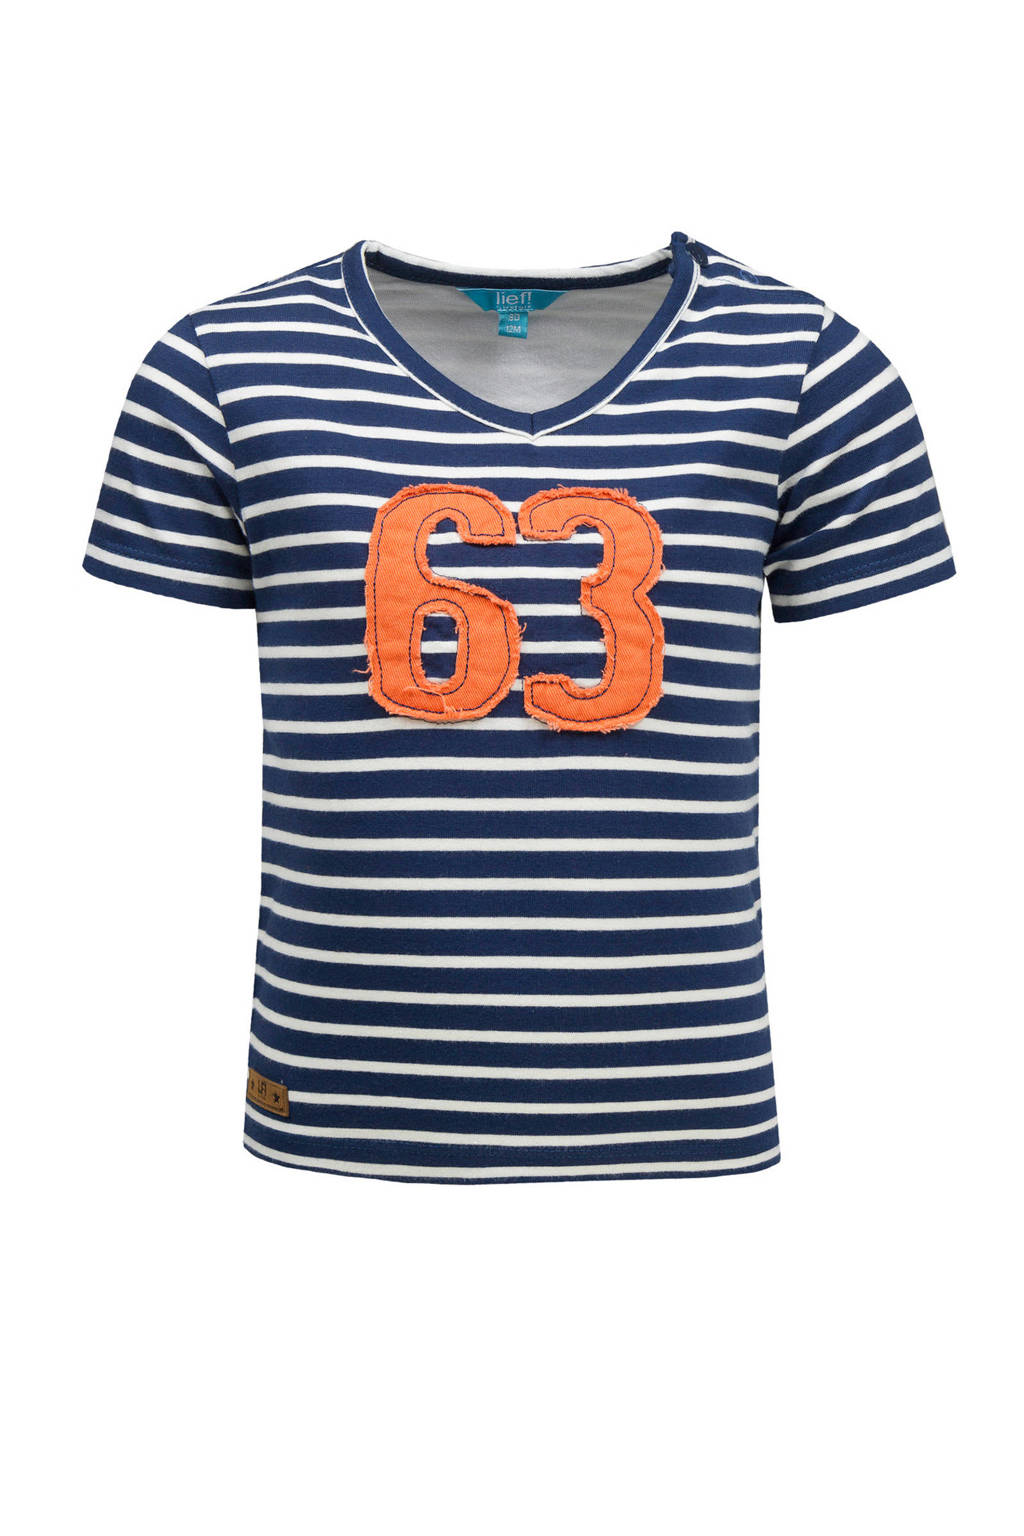 lief! baby gestreept T-shirt donkerblauw/wit/oranje, Donkerblauw/wit/oranje